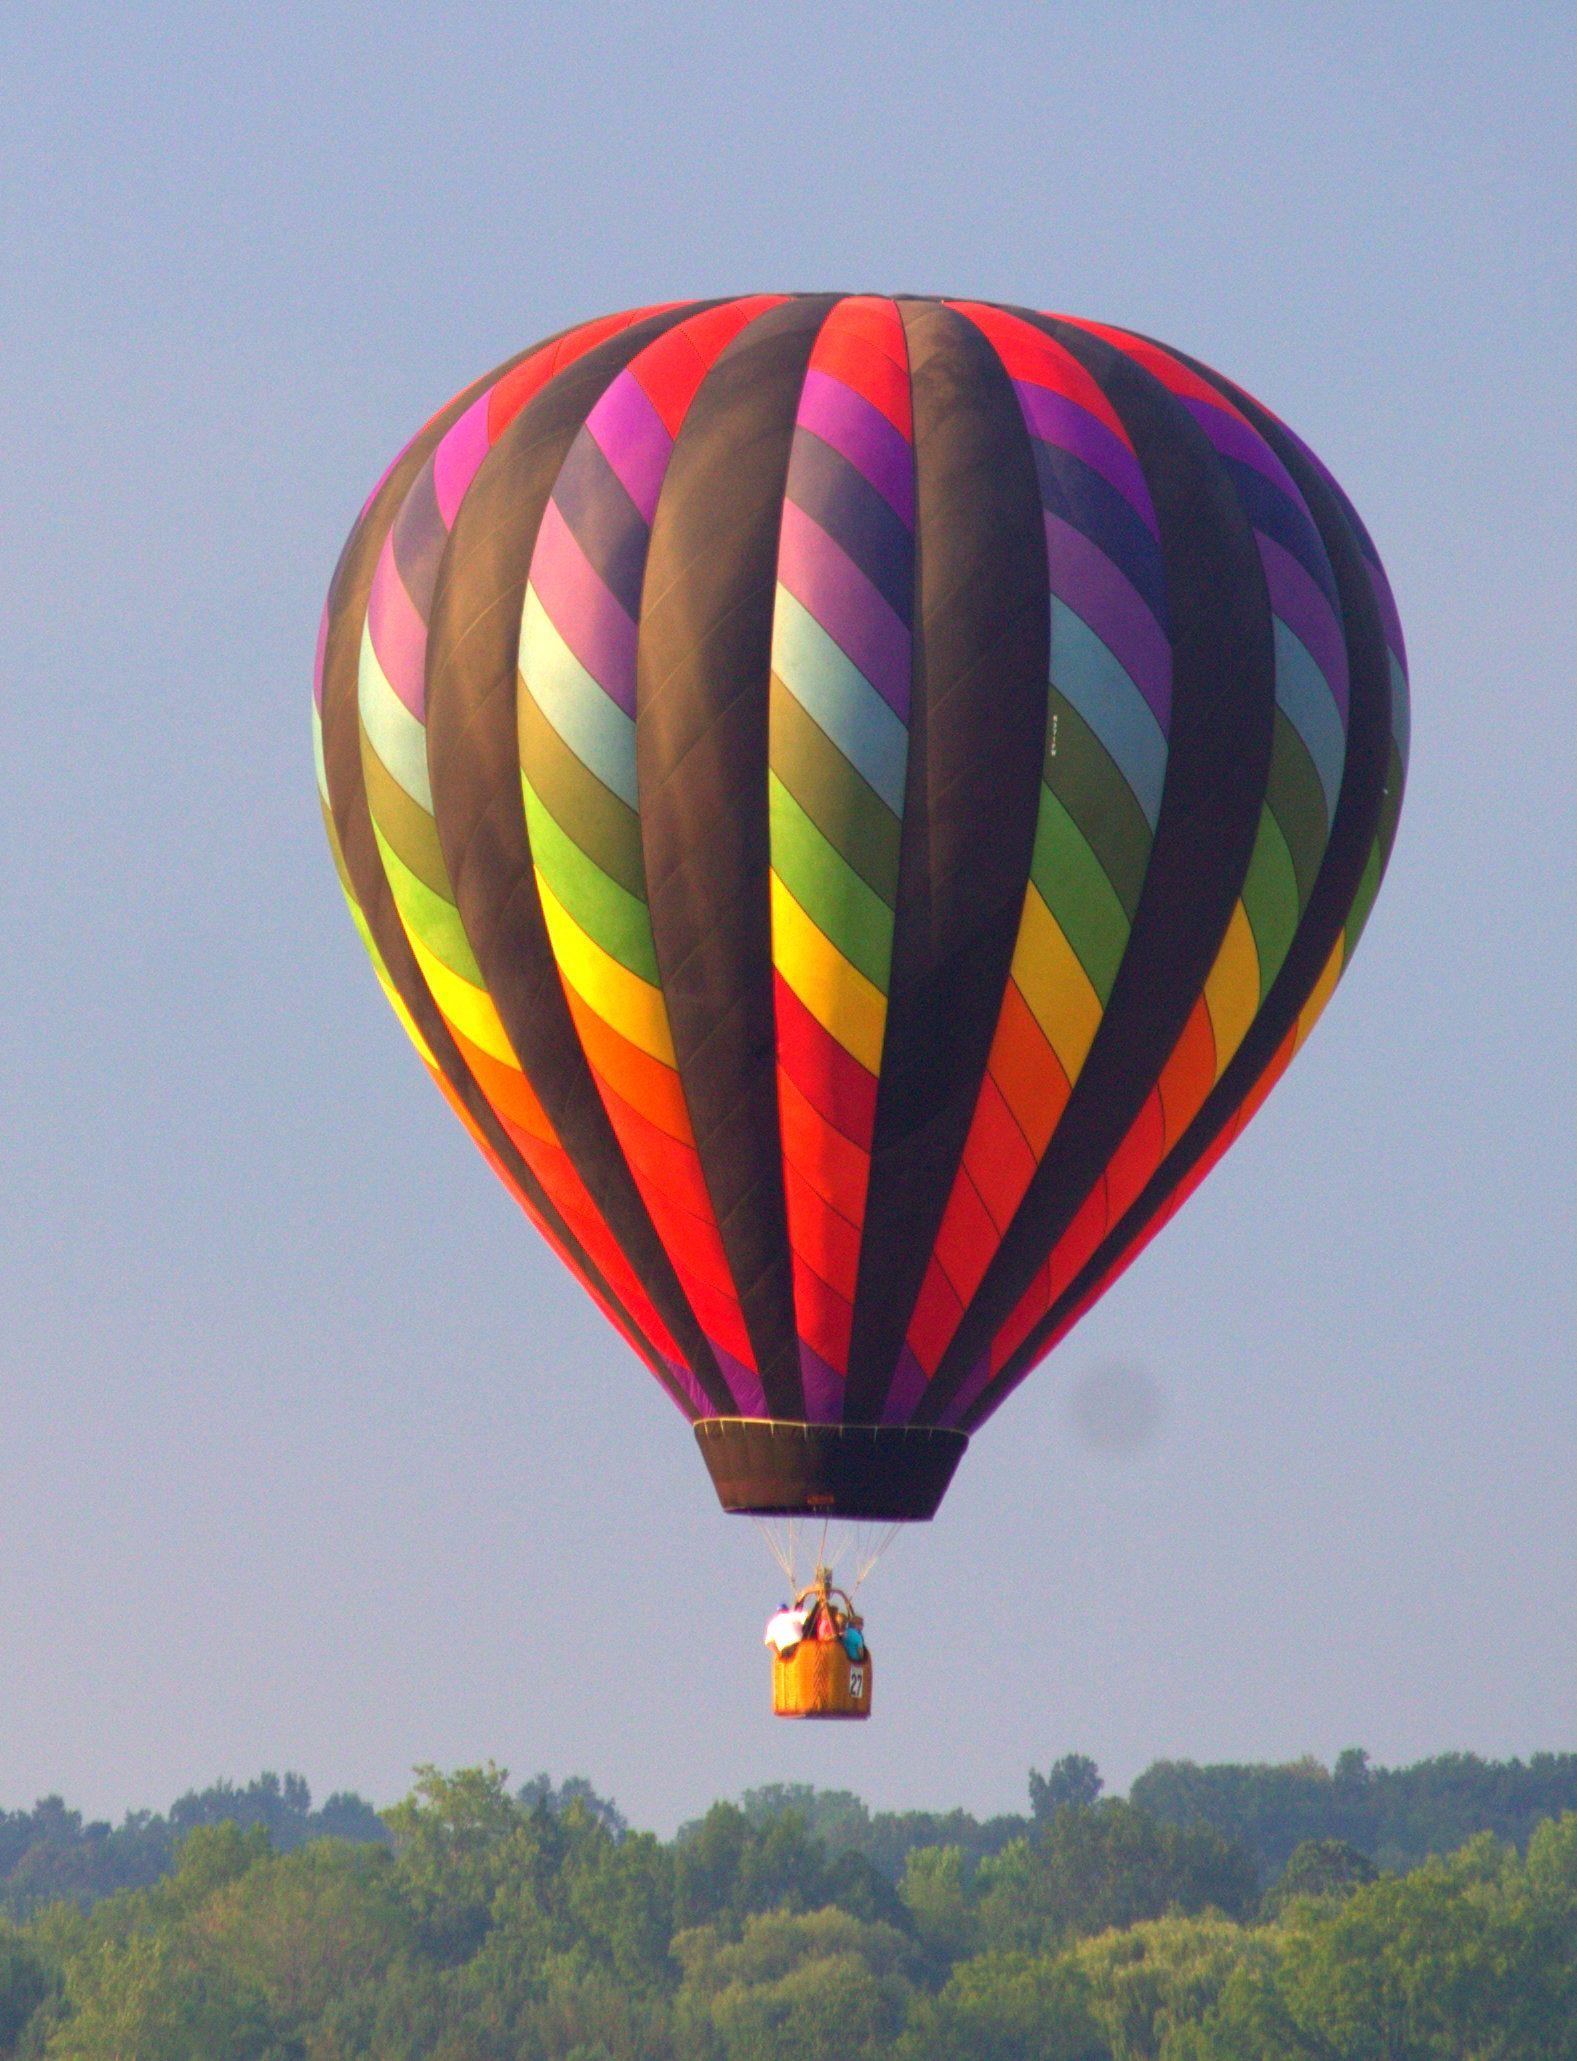 Dansville NY Hot Air Balloons show 2013 Hot air, Hot air